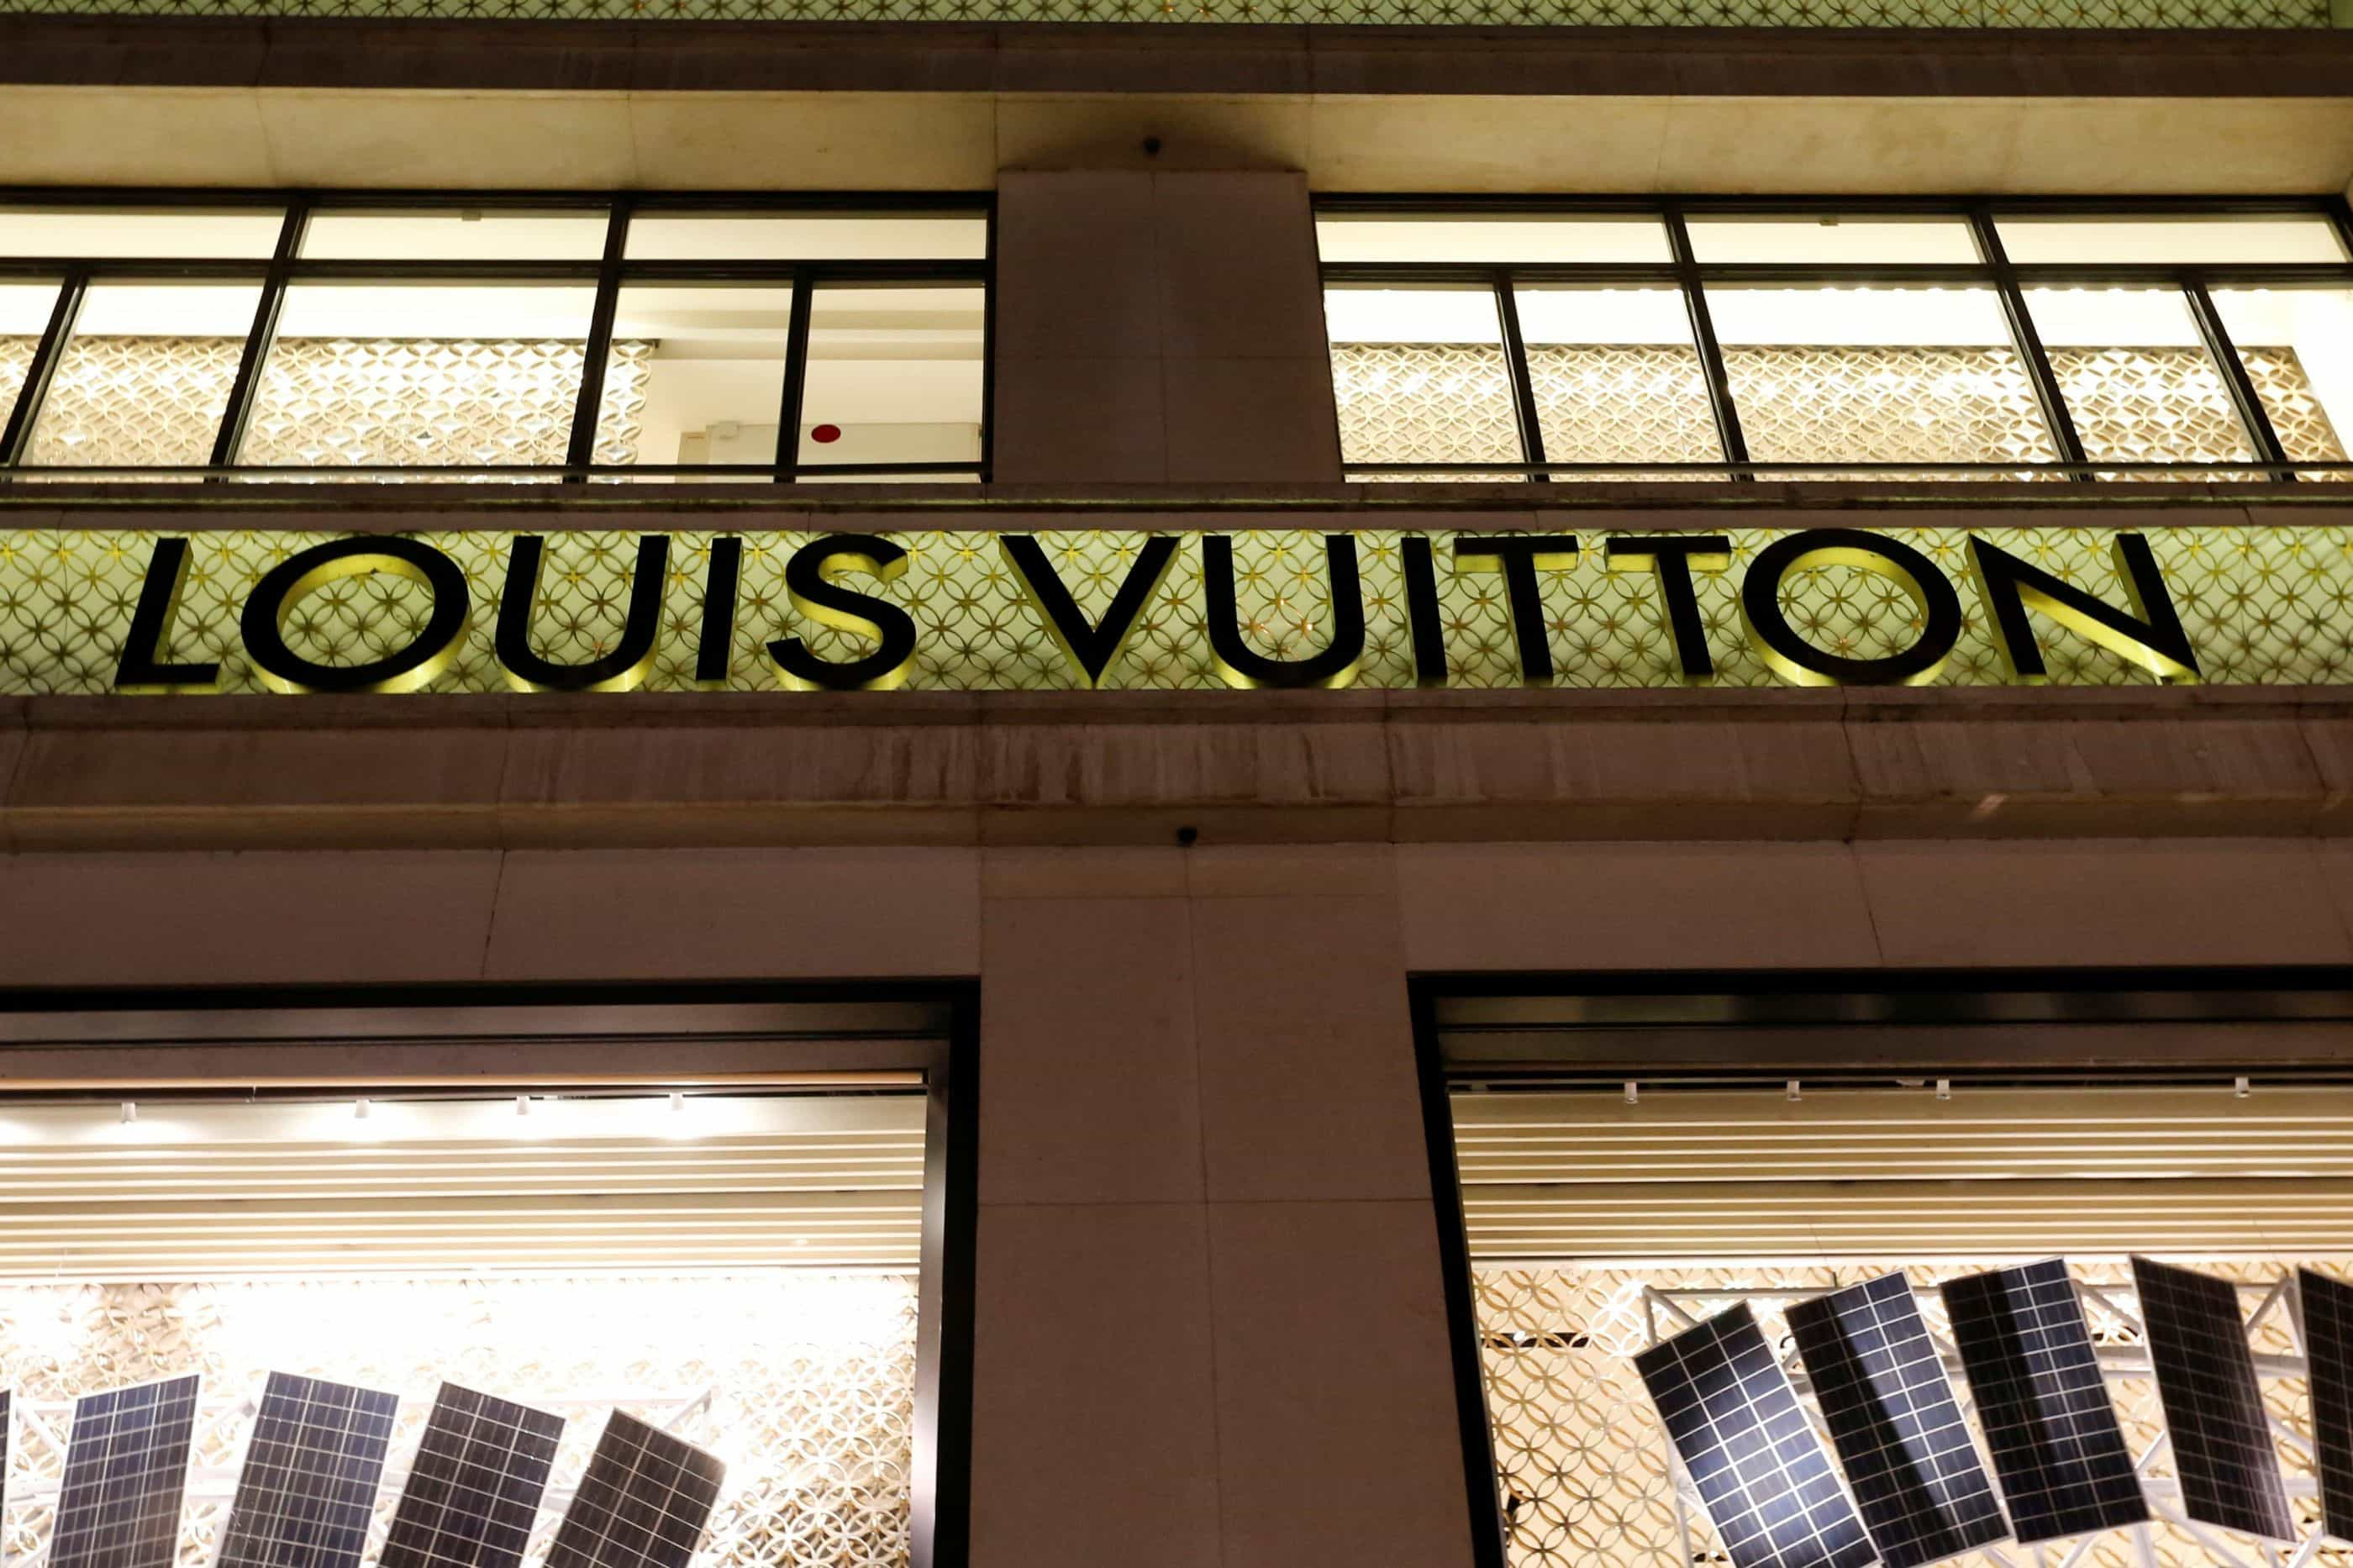 Morreu Alain Chevalier, um dos fundadores da francesa Louis Vuitton